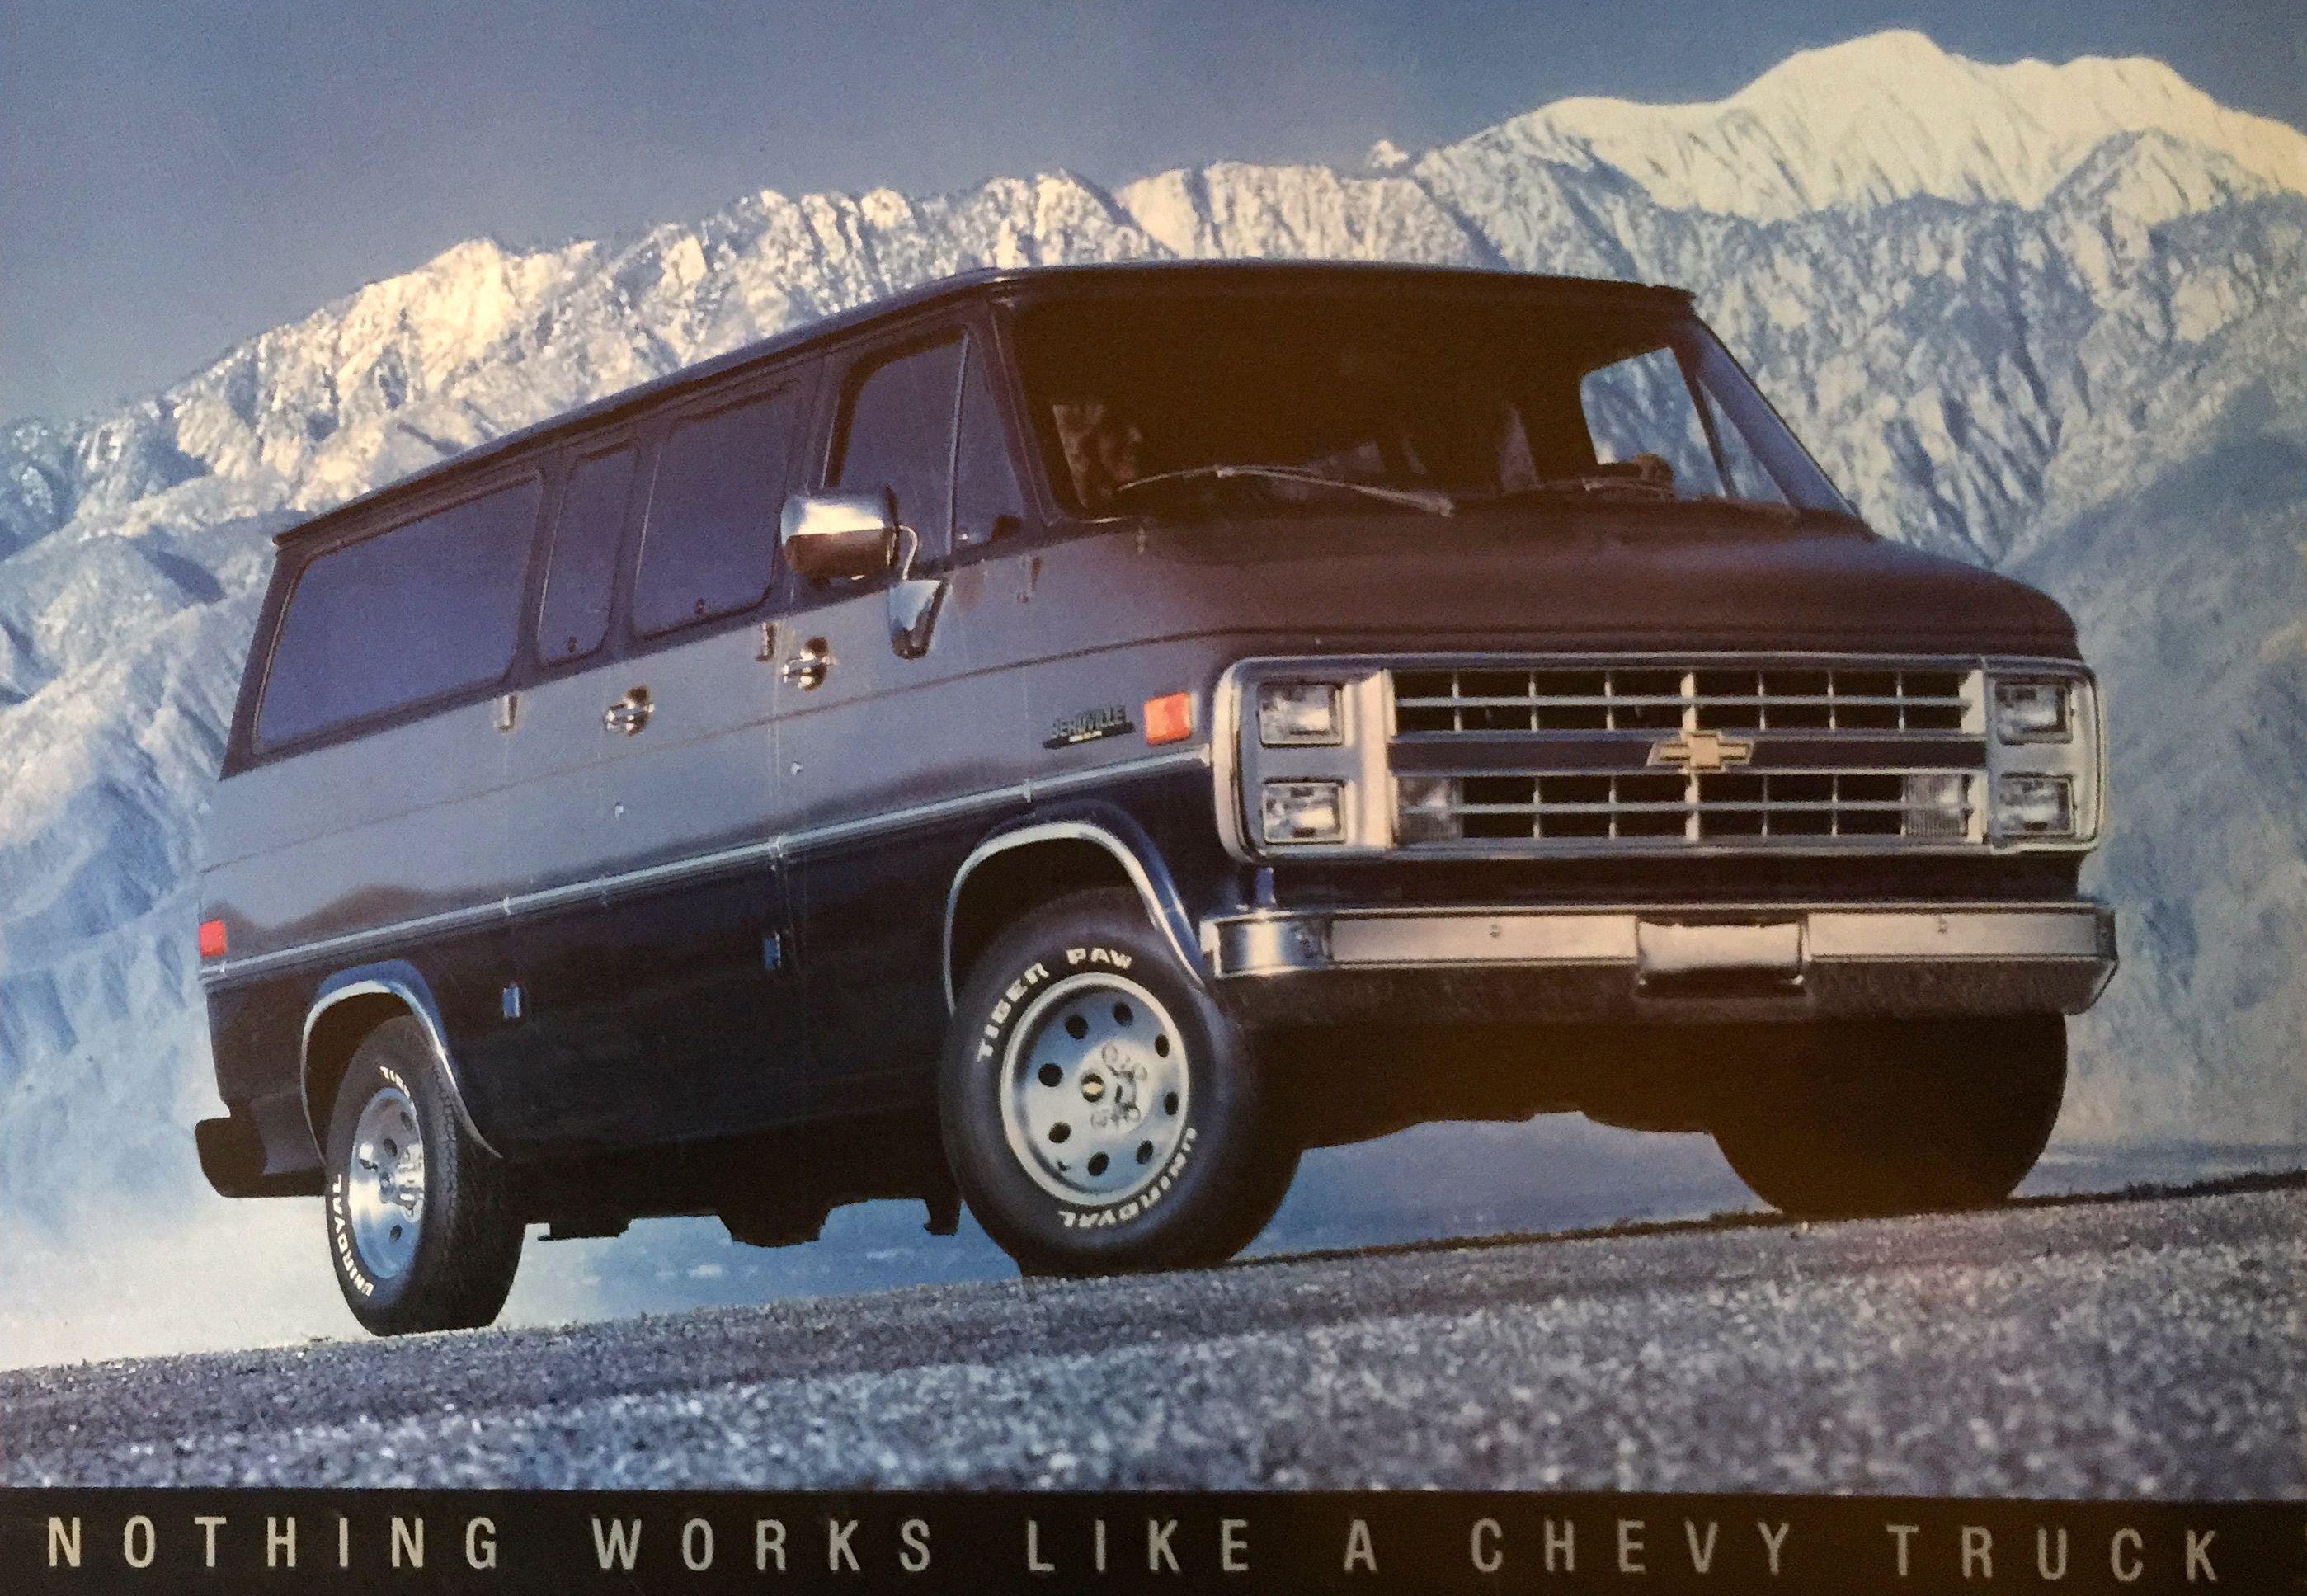 Chevrolet van beauville taken to the road pinterest chevrolet van chevrolet and vans